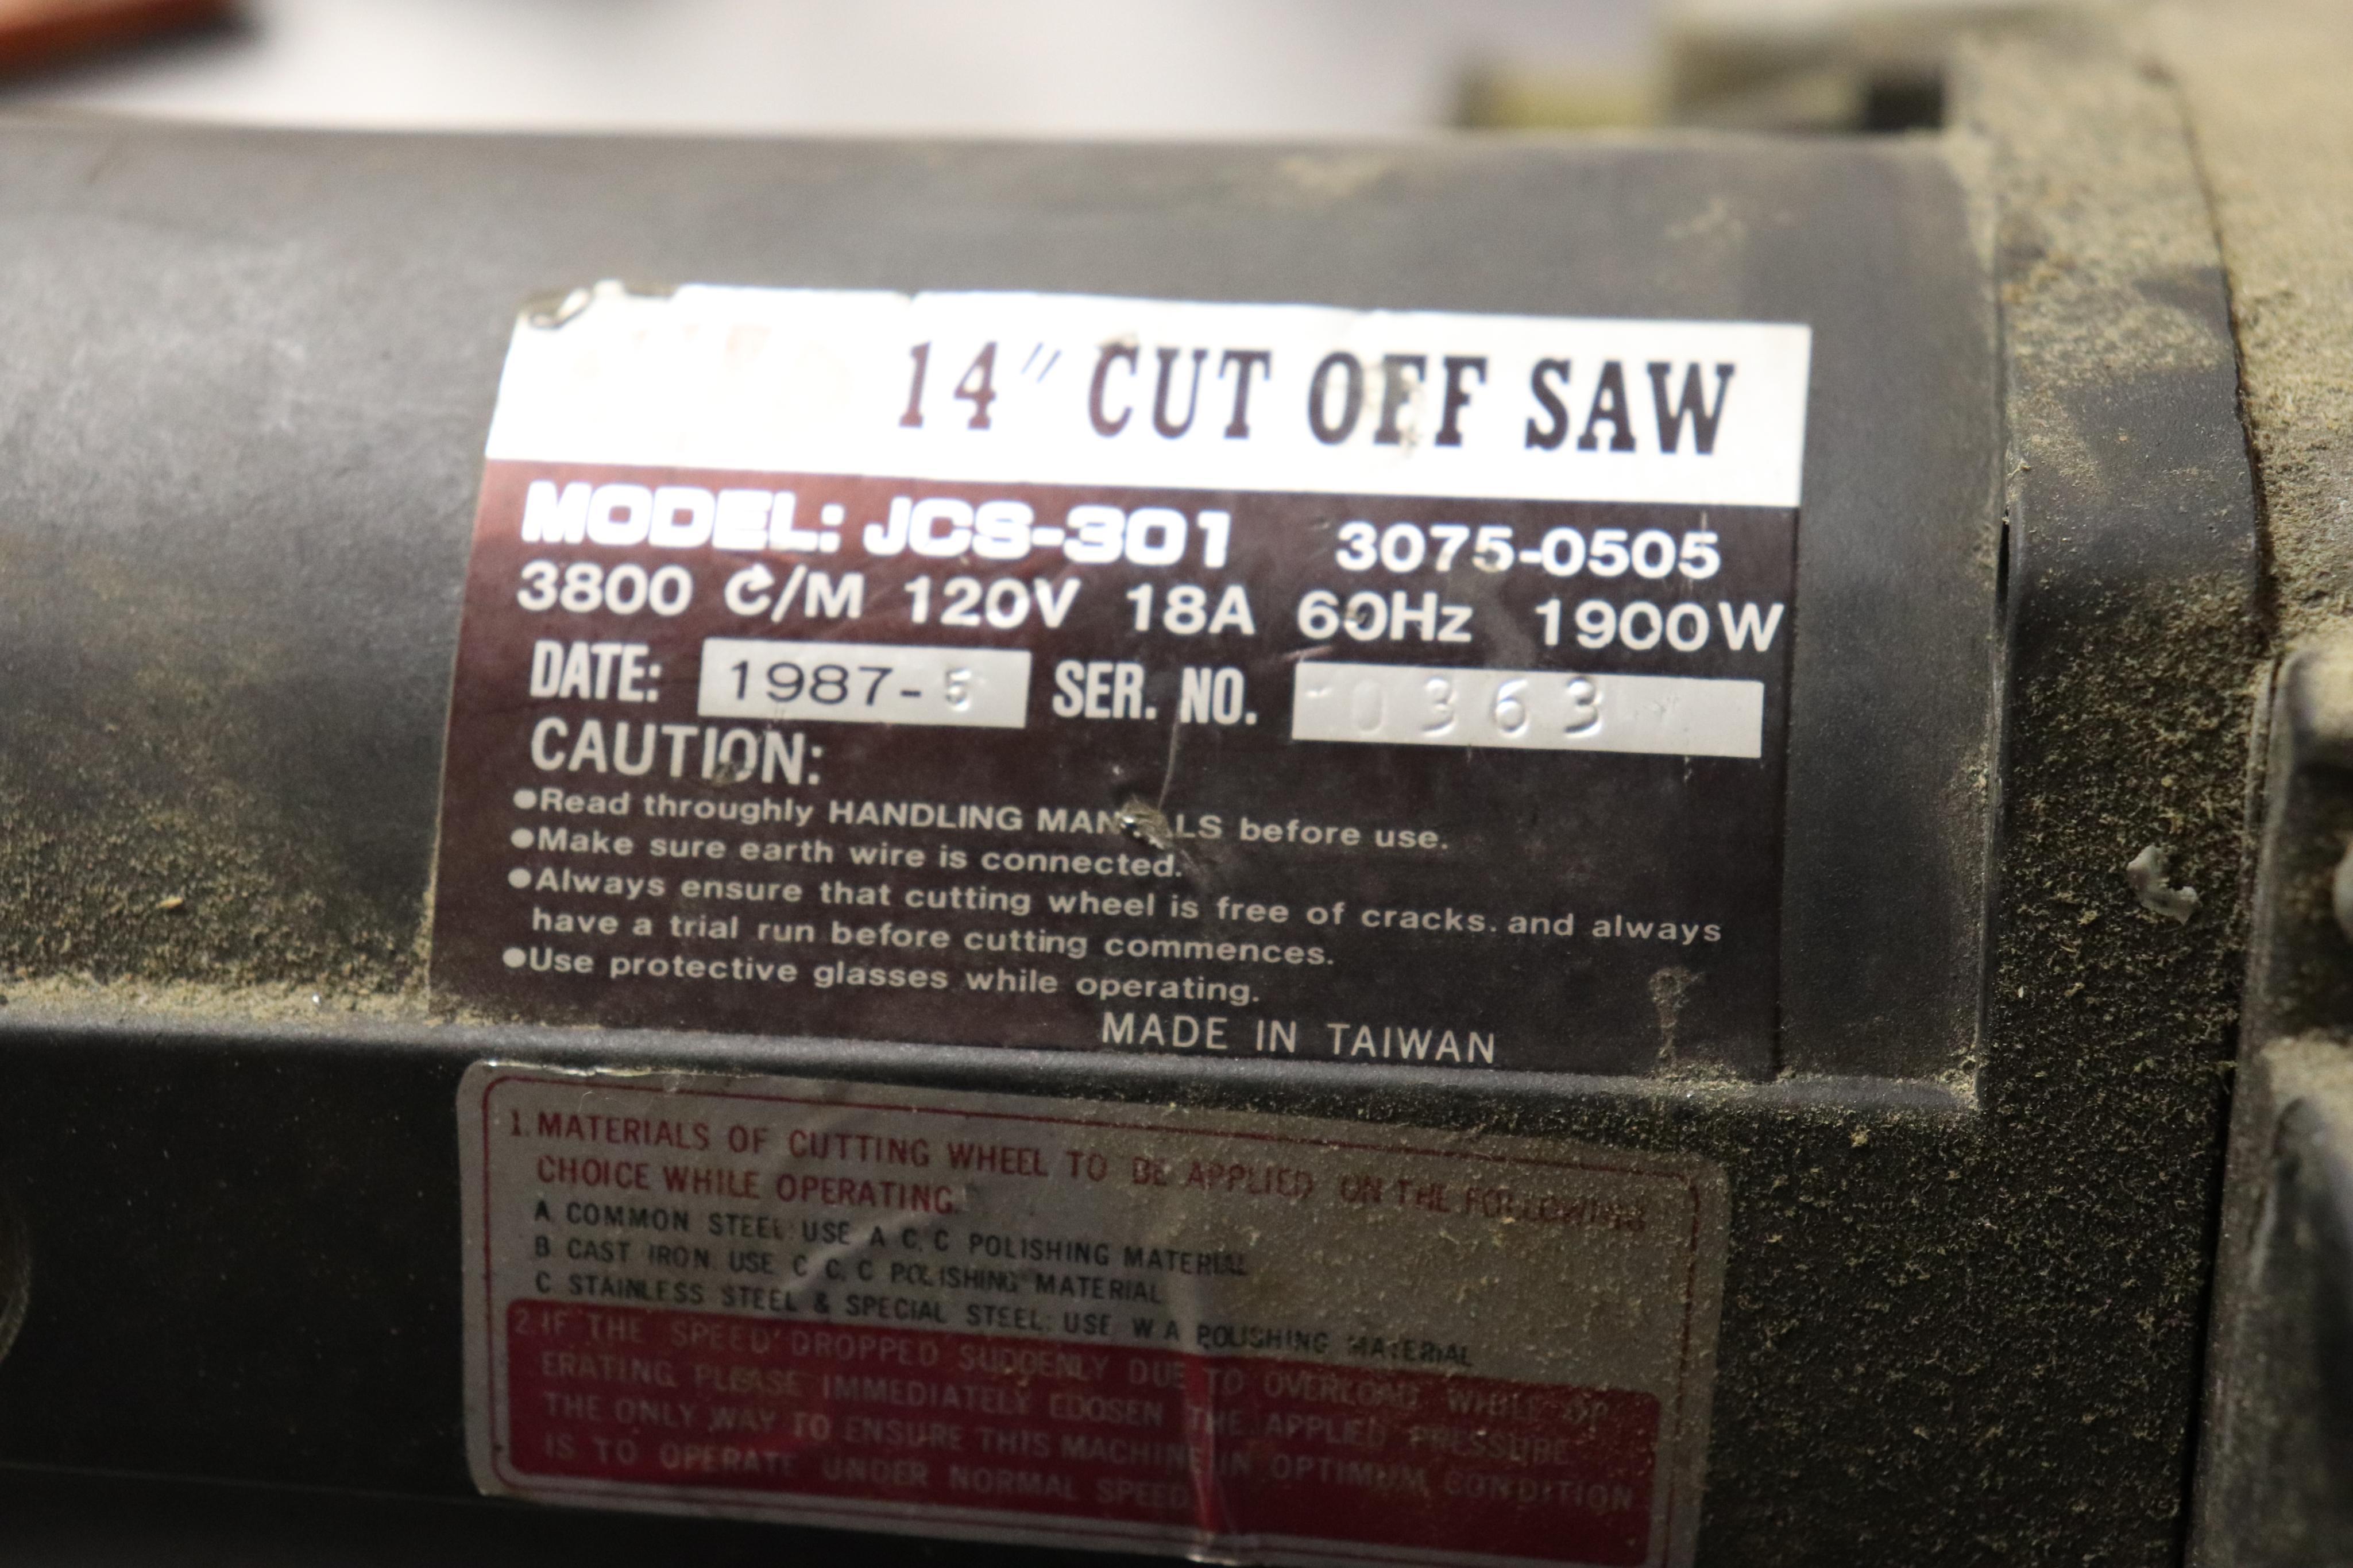 "WT JCS-301 14"" cut off saw - Image 3 of 3"